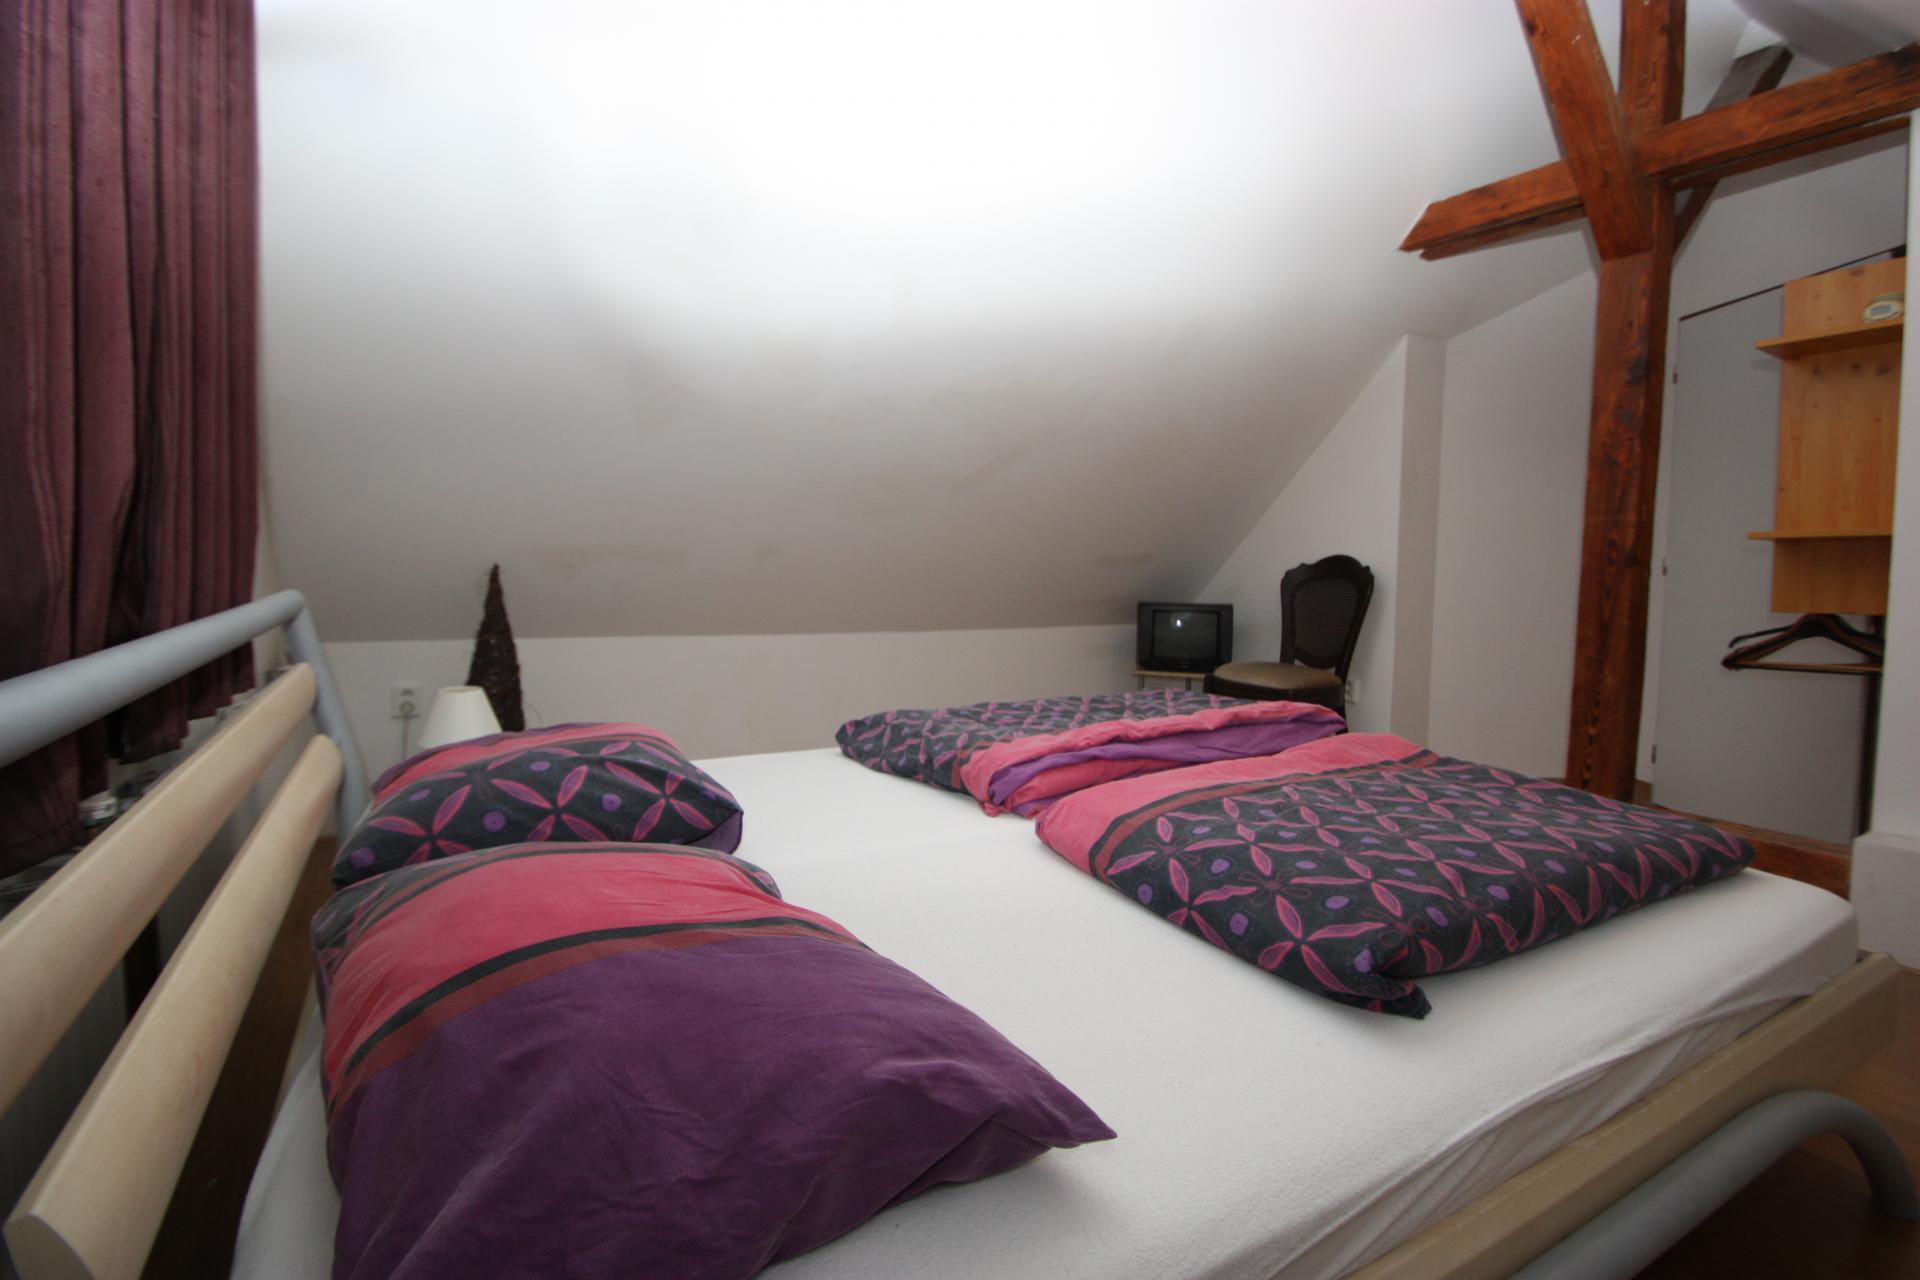 Slaapkamer met tweepersoonsbed